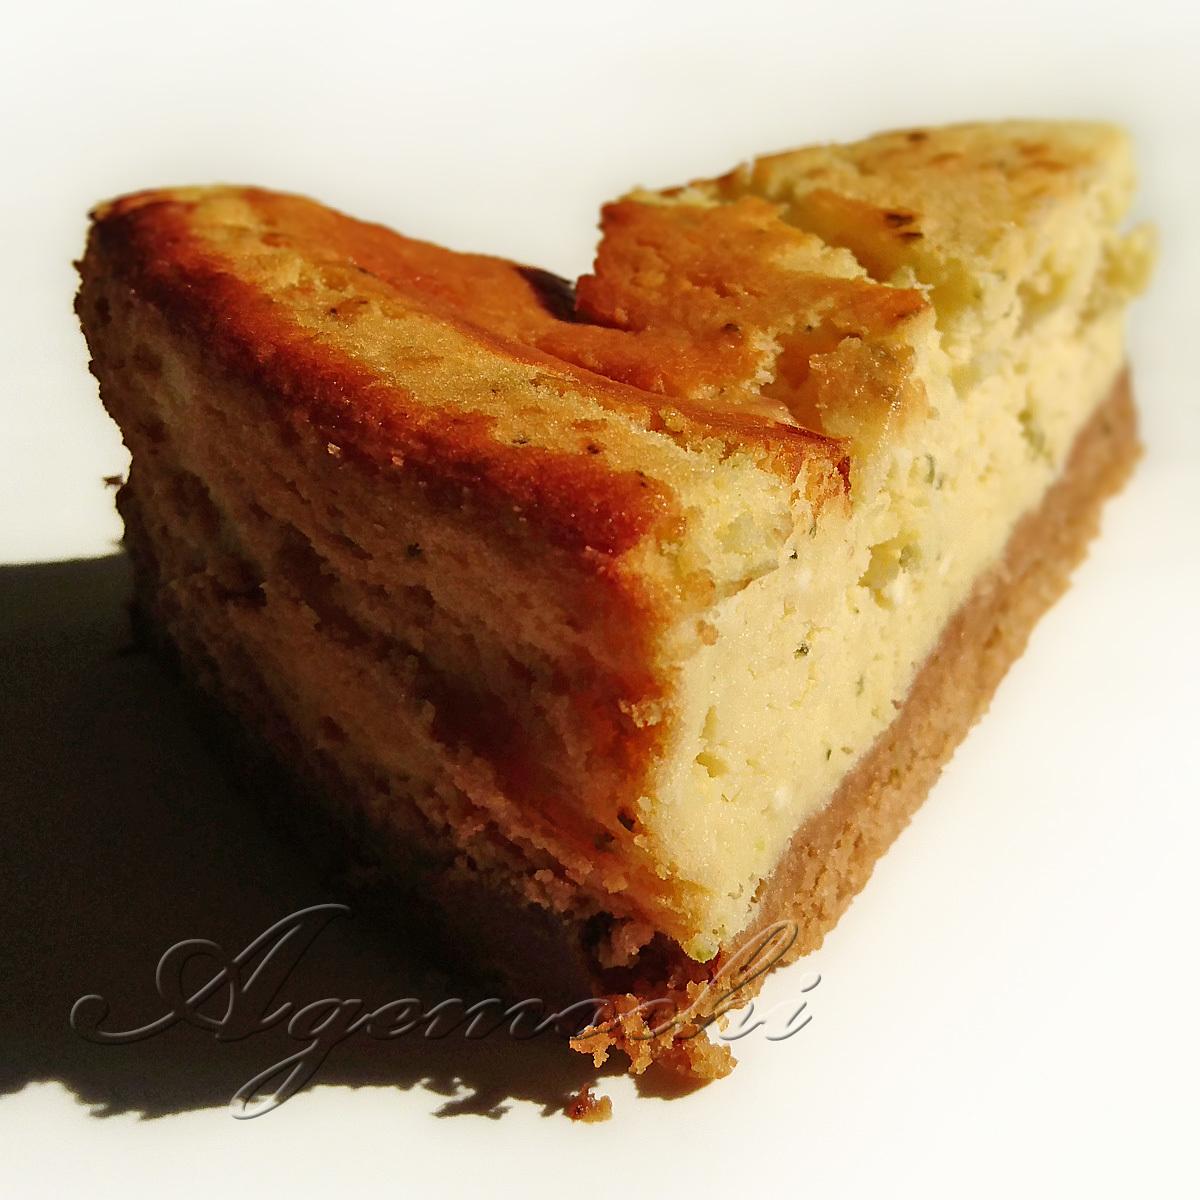 countrycake5_cheesecake.jpg